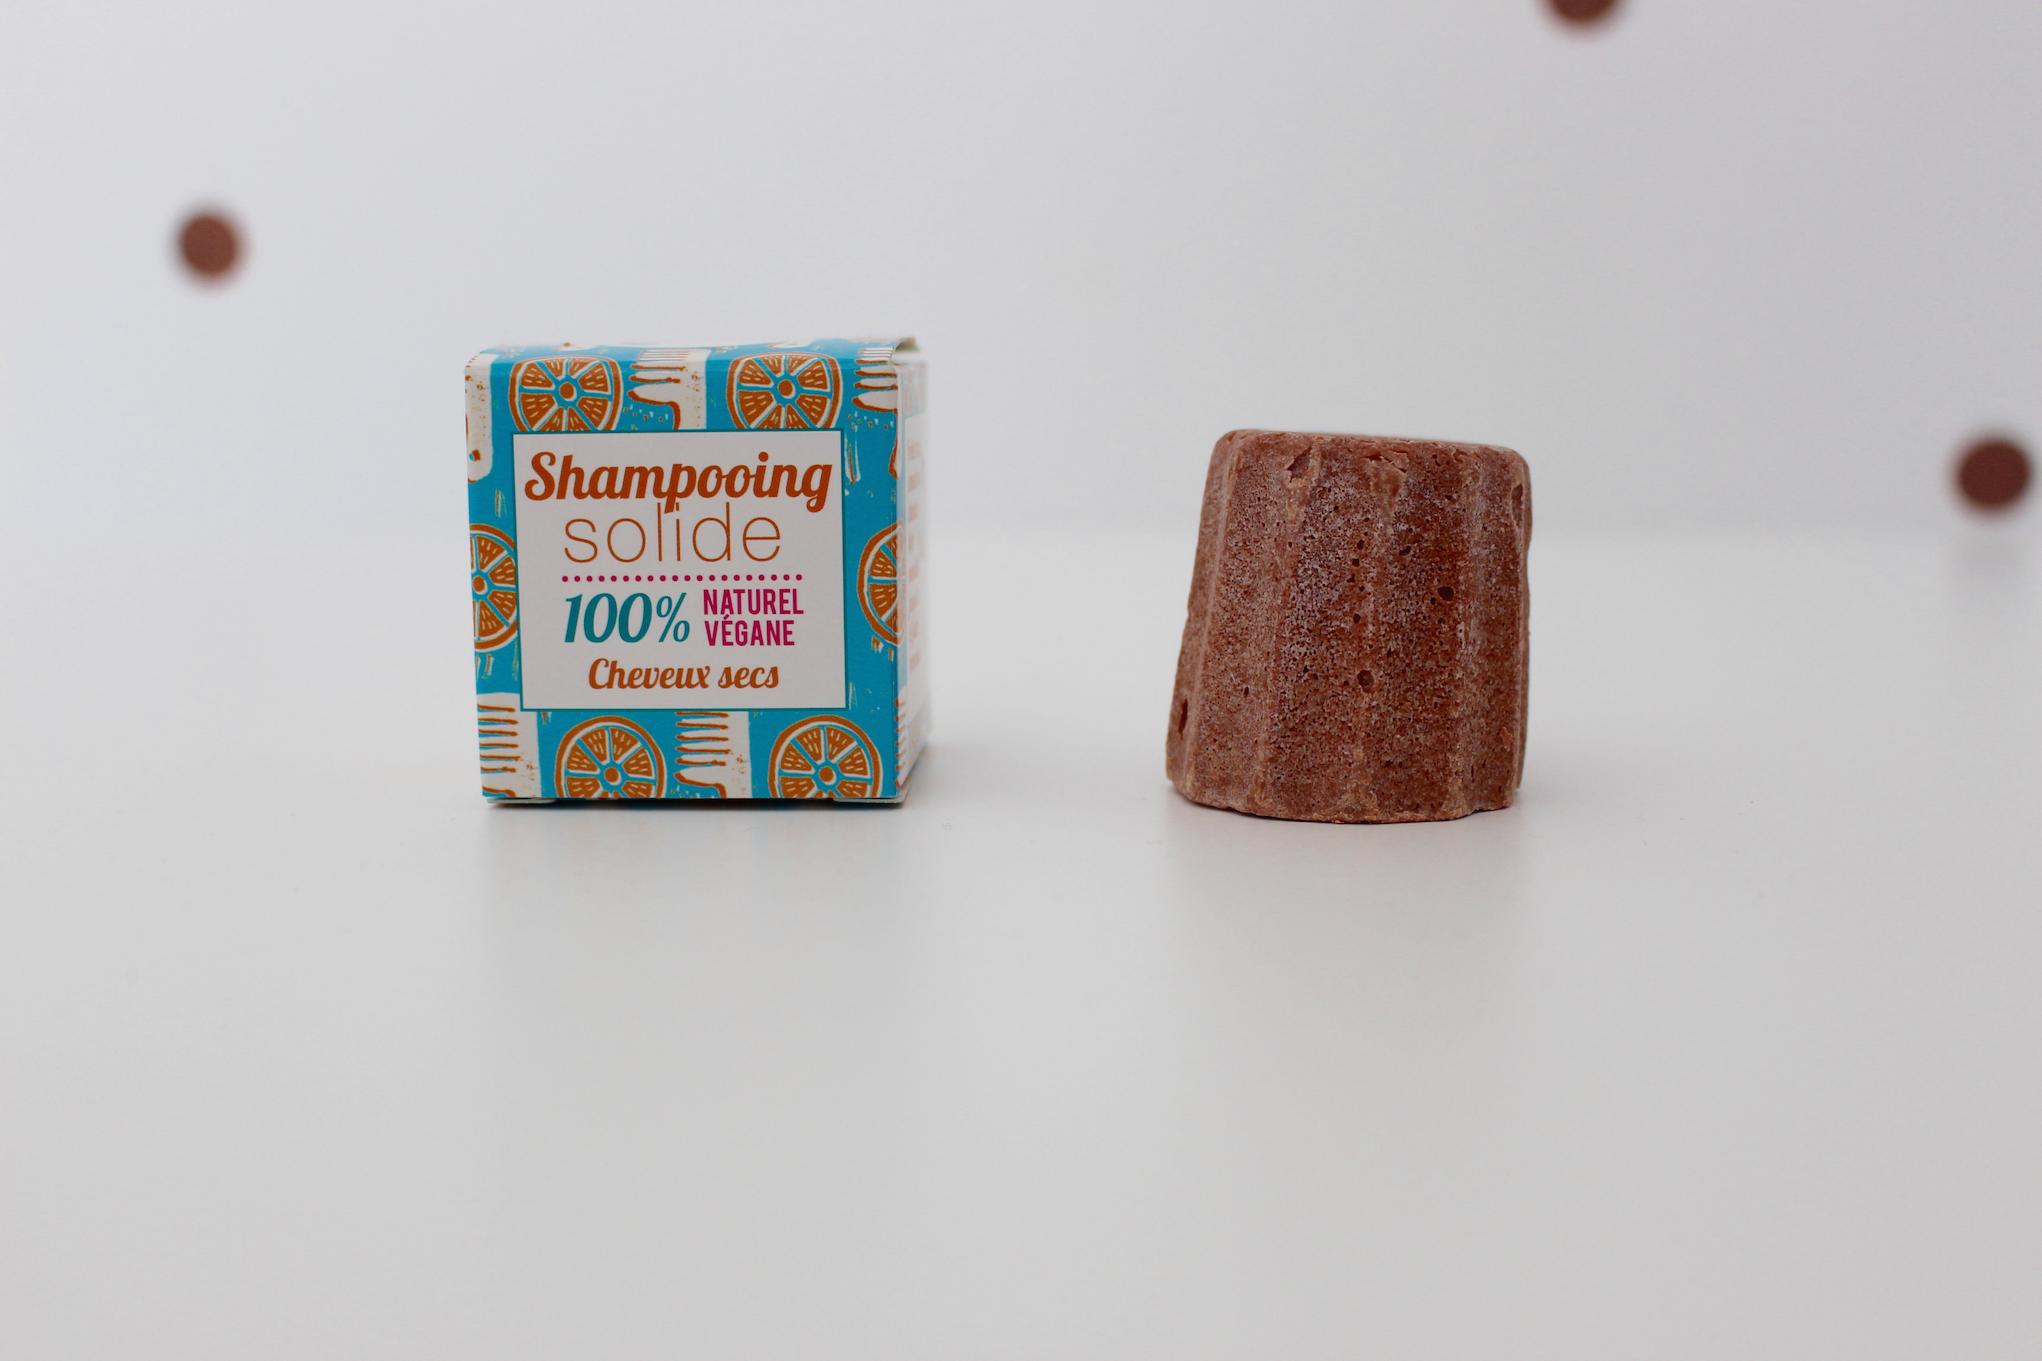 shampooing solide lamazura mademoiselle-e